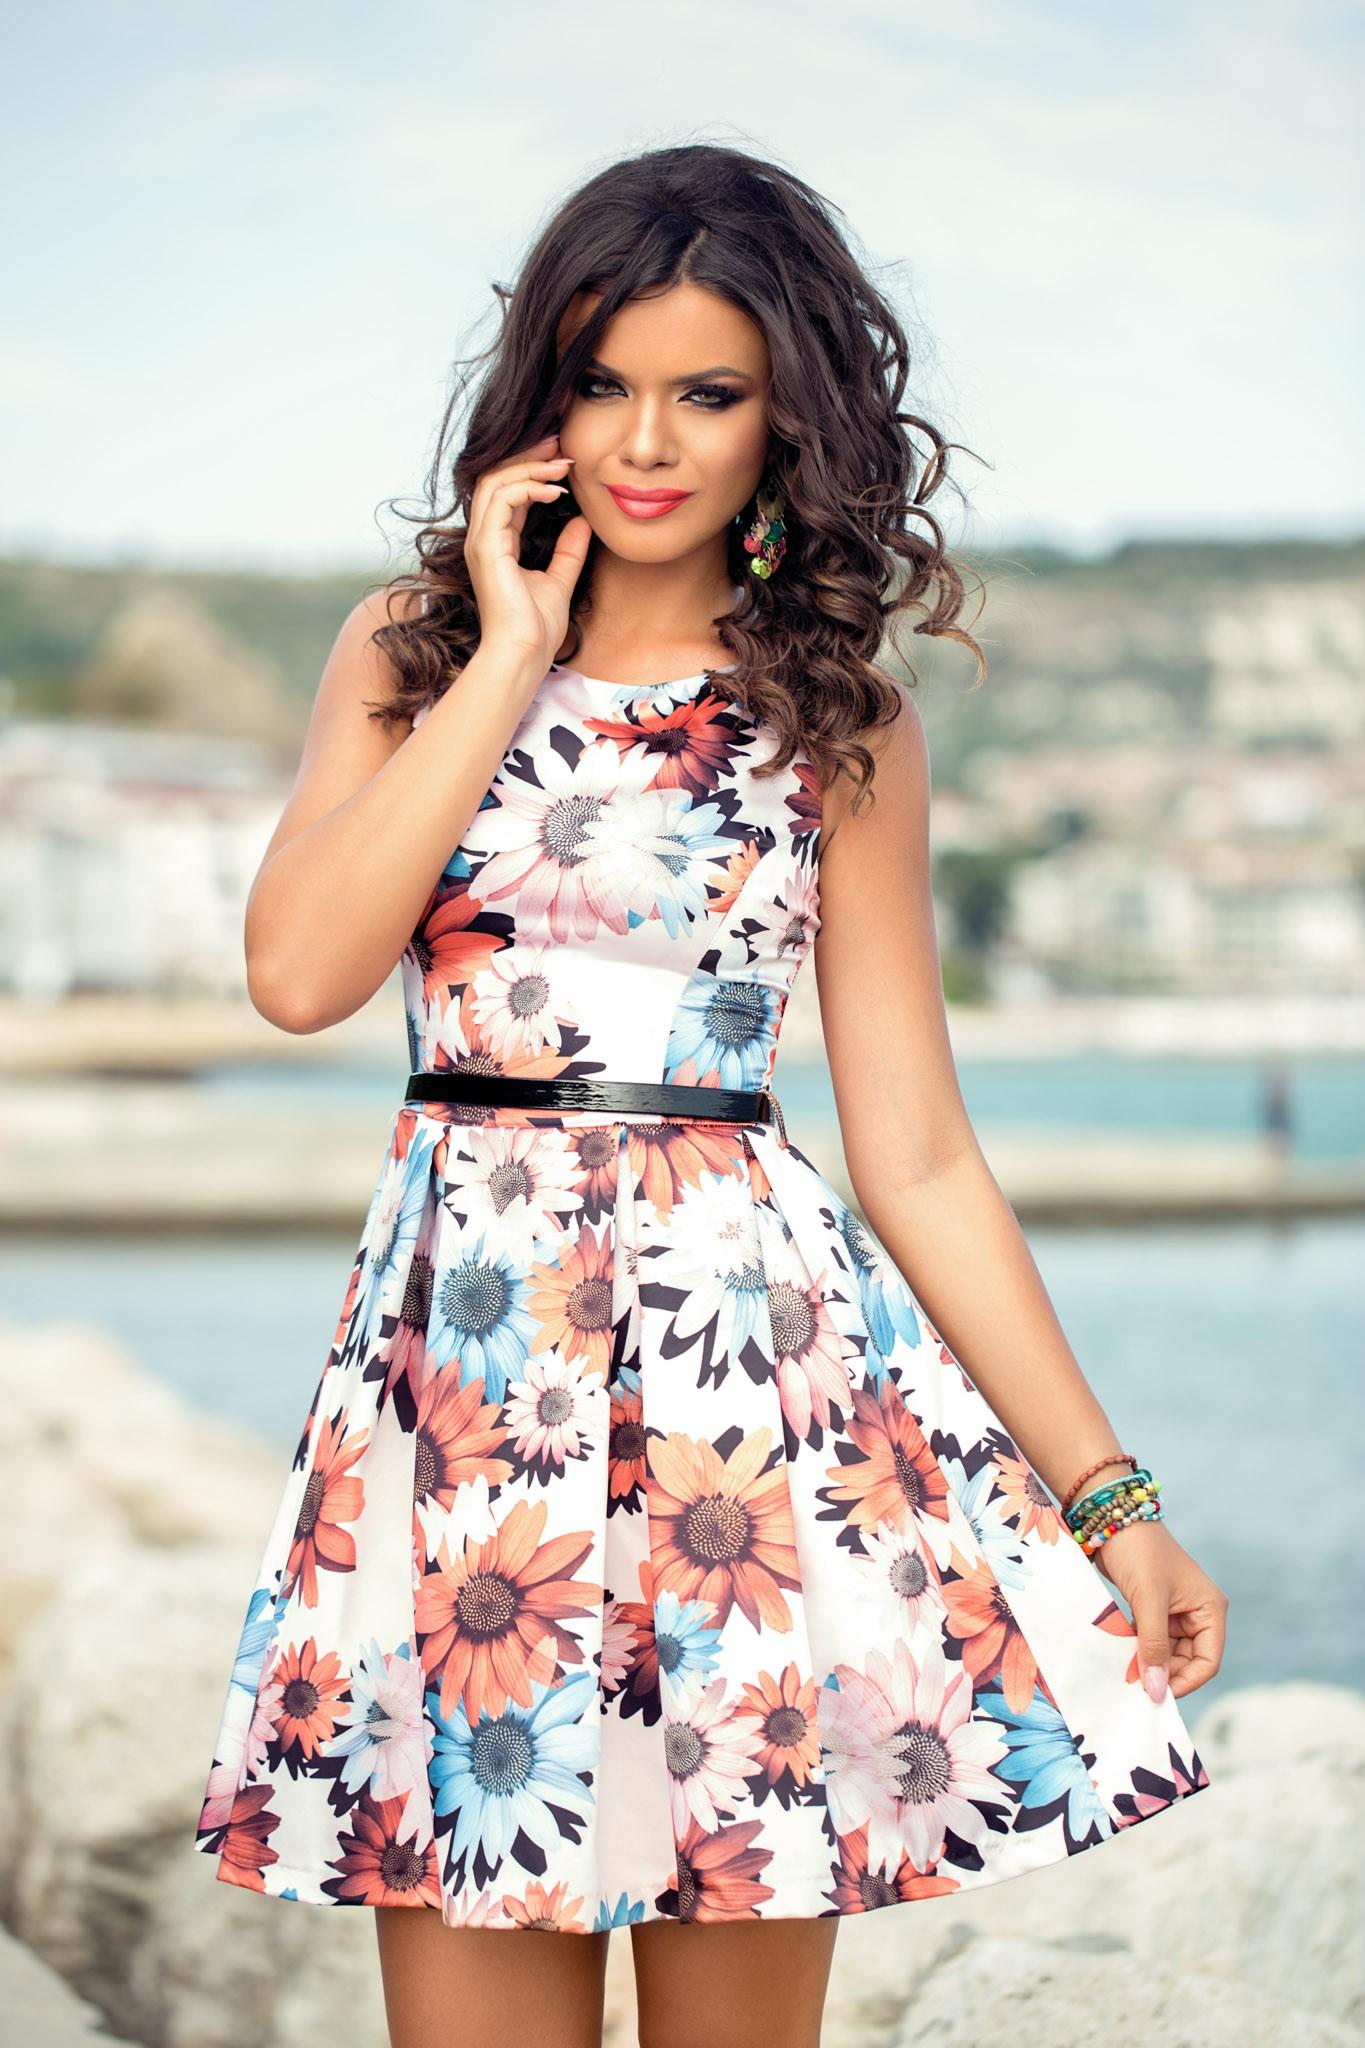 rochie_scurta_din_satin_cu_imprimeu_floral_ieftina